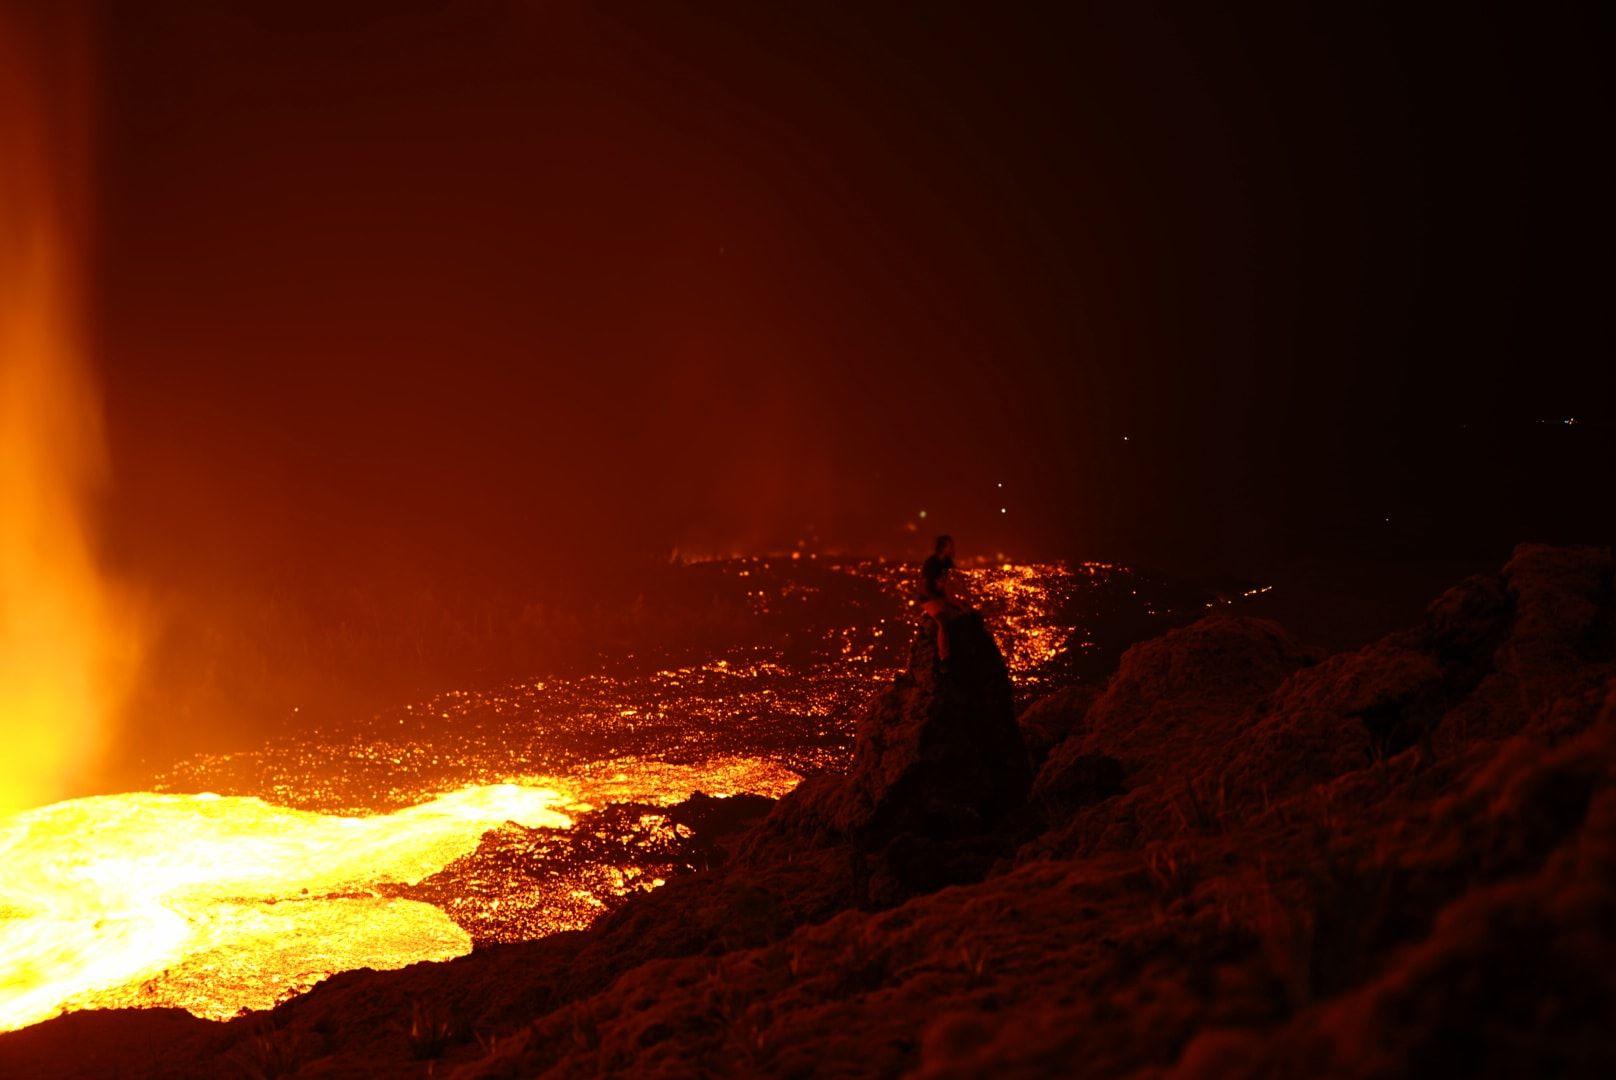 26 Octobre 2019. FR . La Réunion : Piton de la Fournaise , Chili : Nevados de Chillan , Alaska : Shishaldin , Kamchatka : Klyuchevskoy .